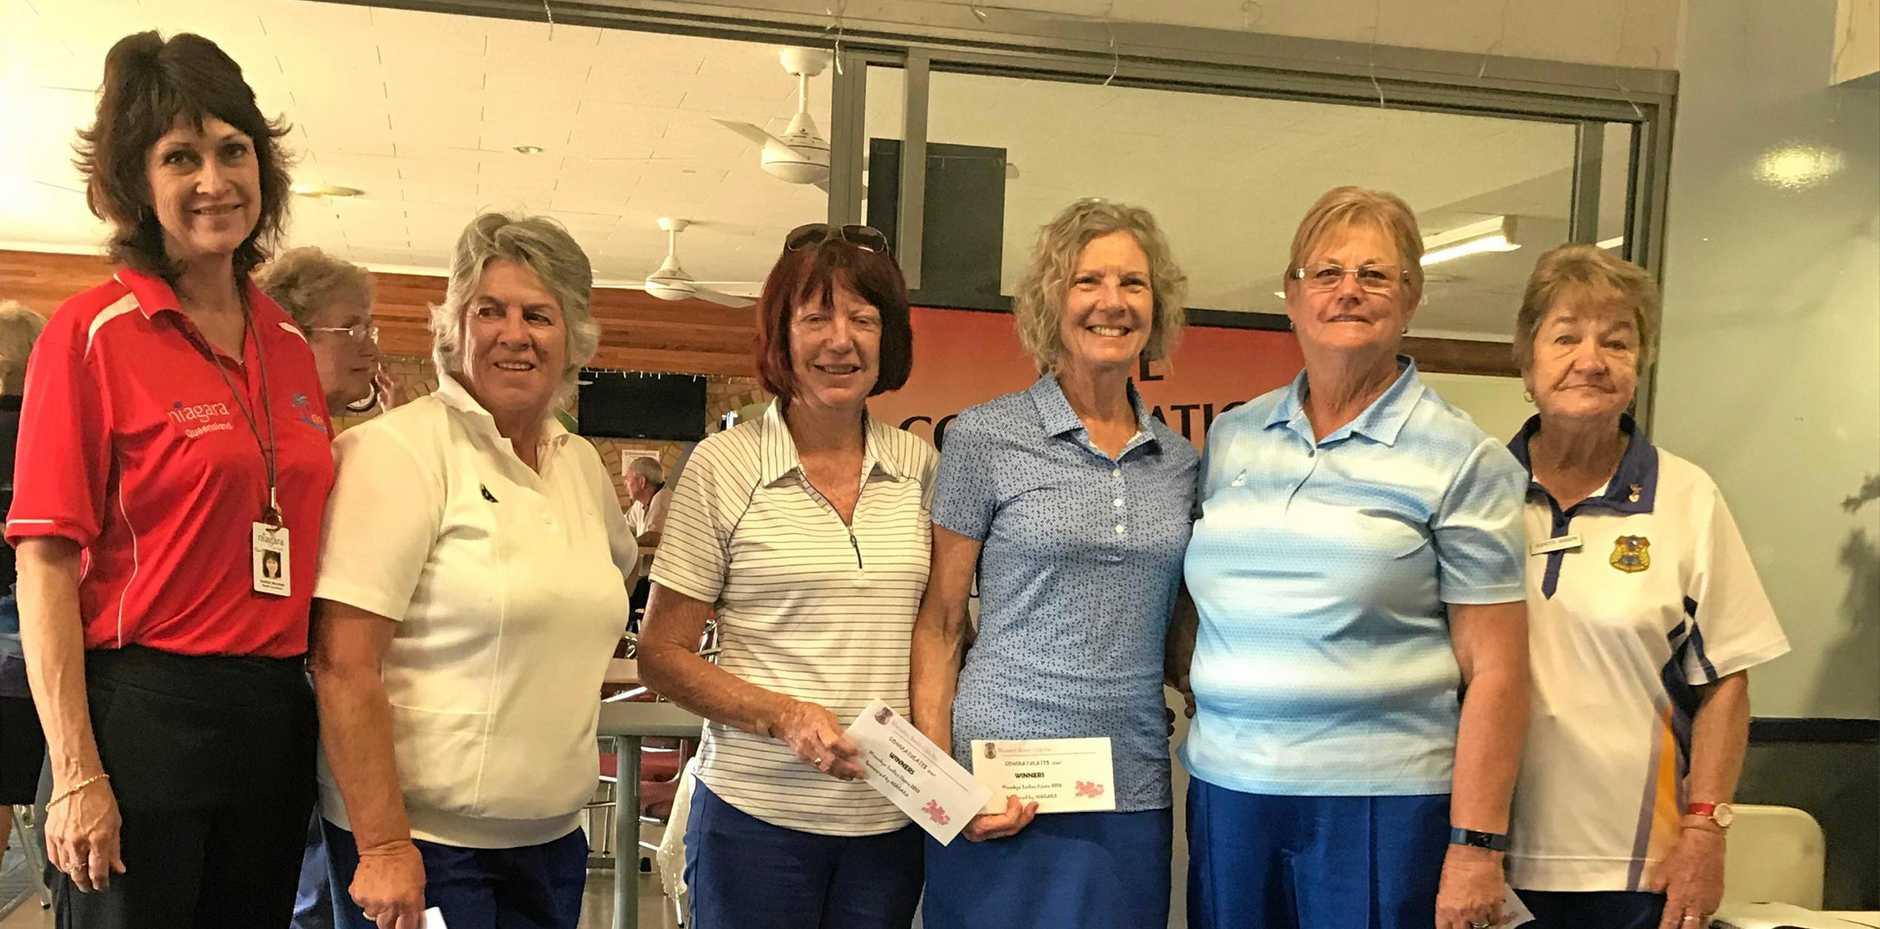 WINNERS ARE GRINNERS: Sponsor Niagara's Heather Marshall with Ladies Fiesta Fours winners Neeta Chant (skip), Desley Williams, Shirley Cornish, Mary Geary and Jeanette Morrow (Woombye Ladies President).